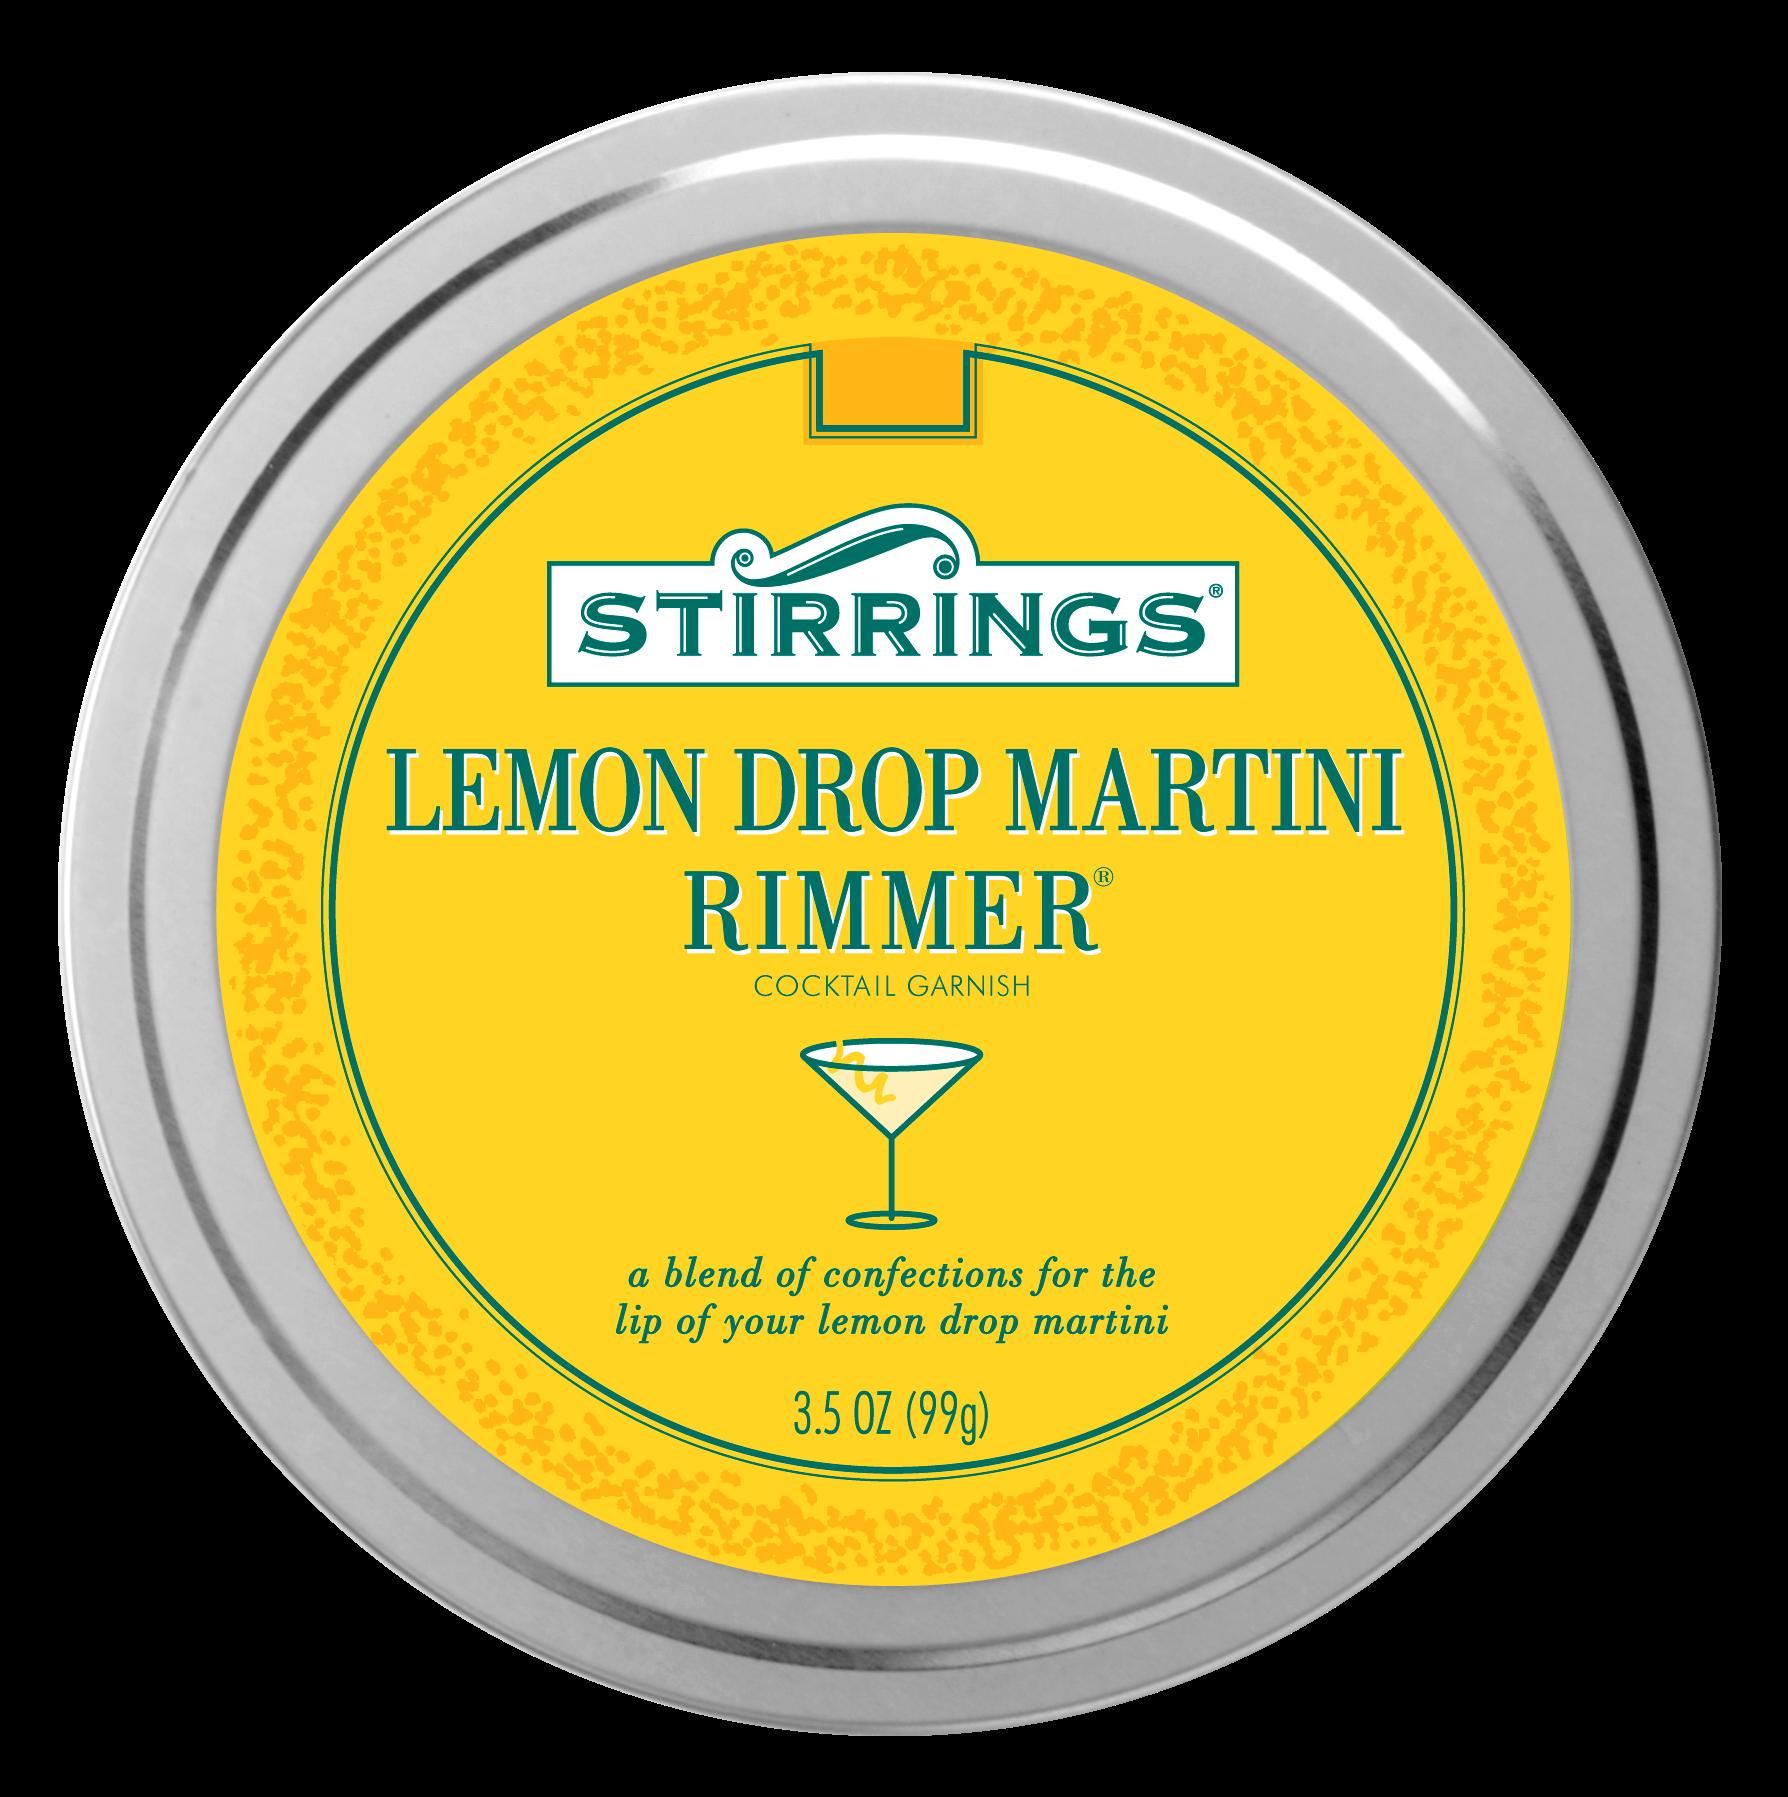 Lemon Drop Rimmer